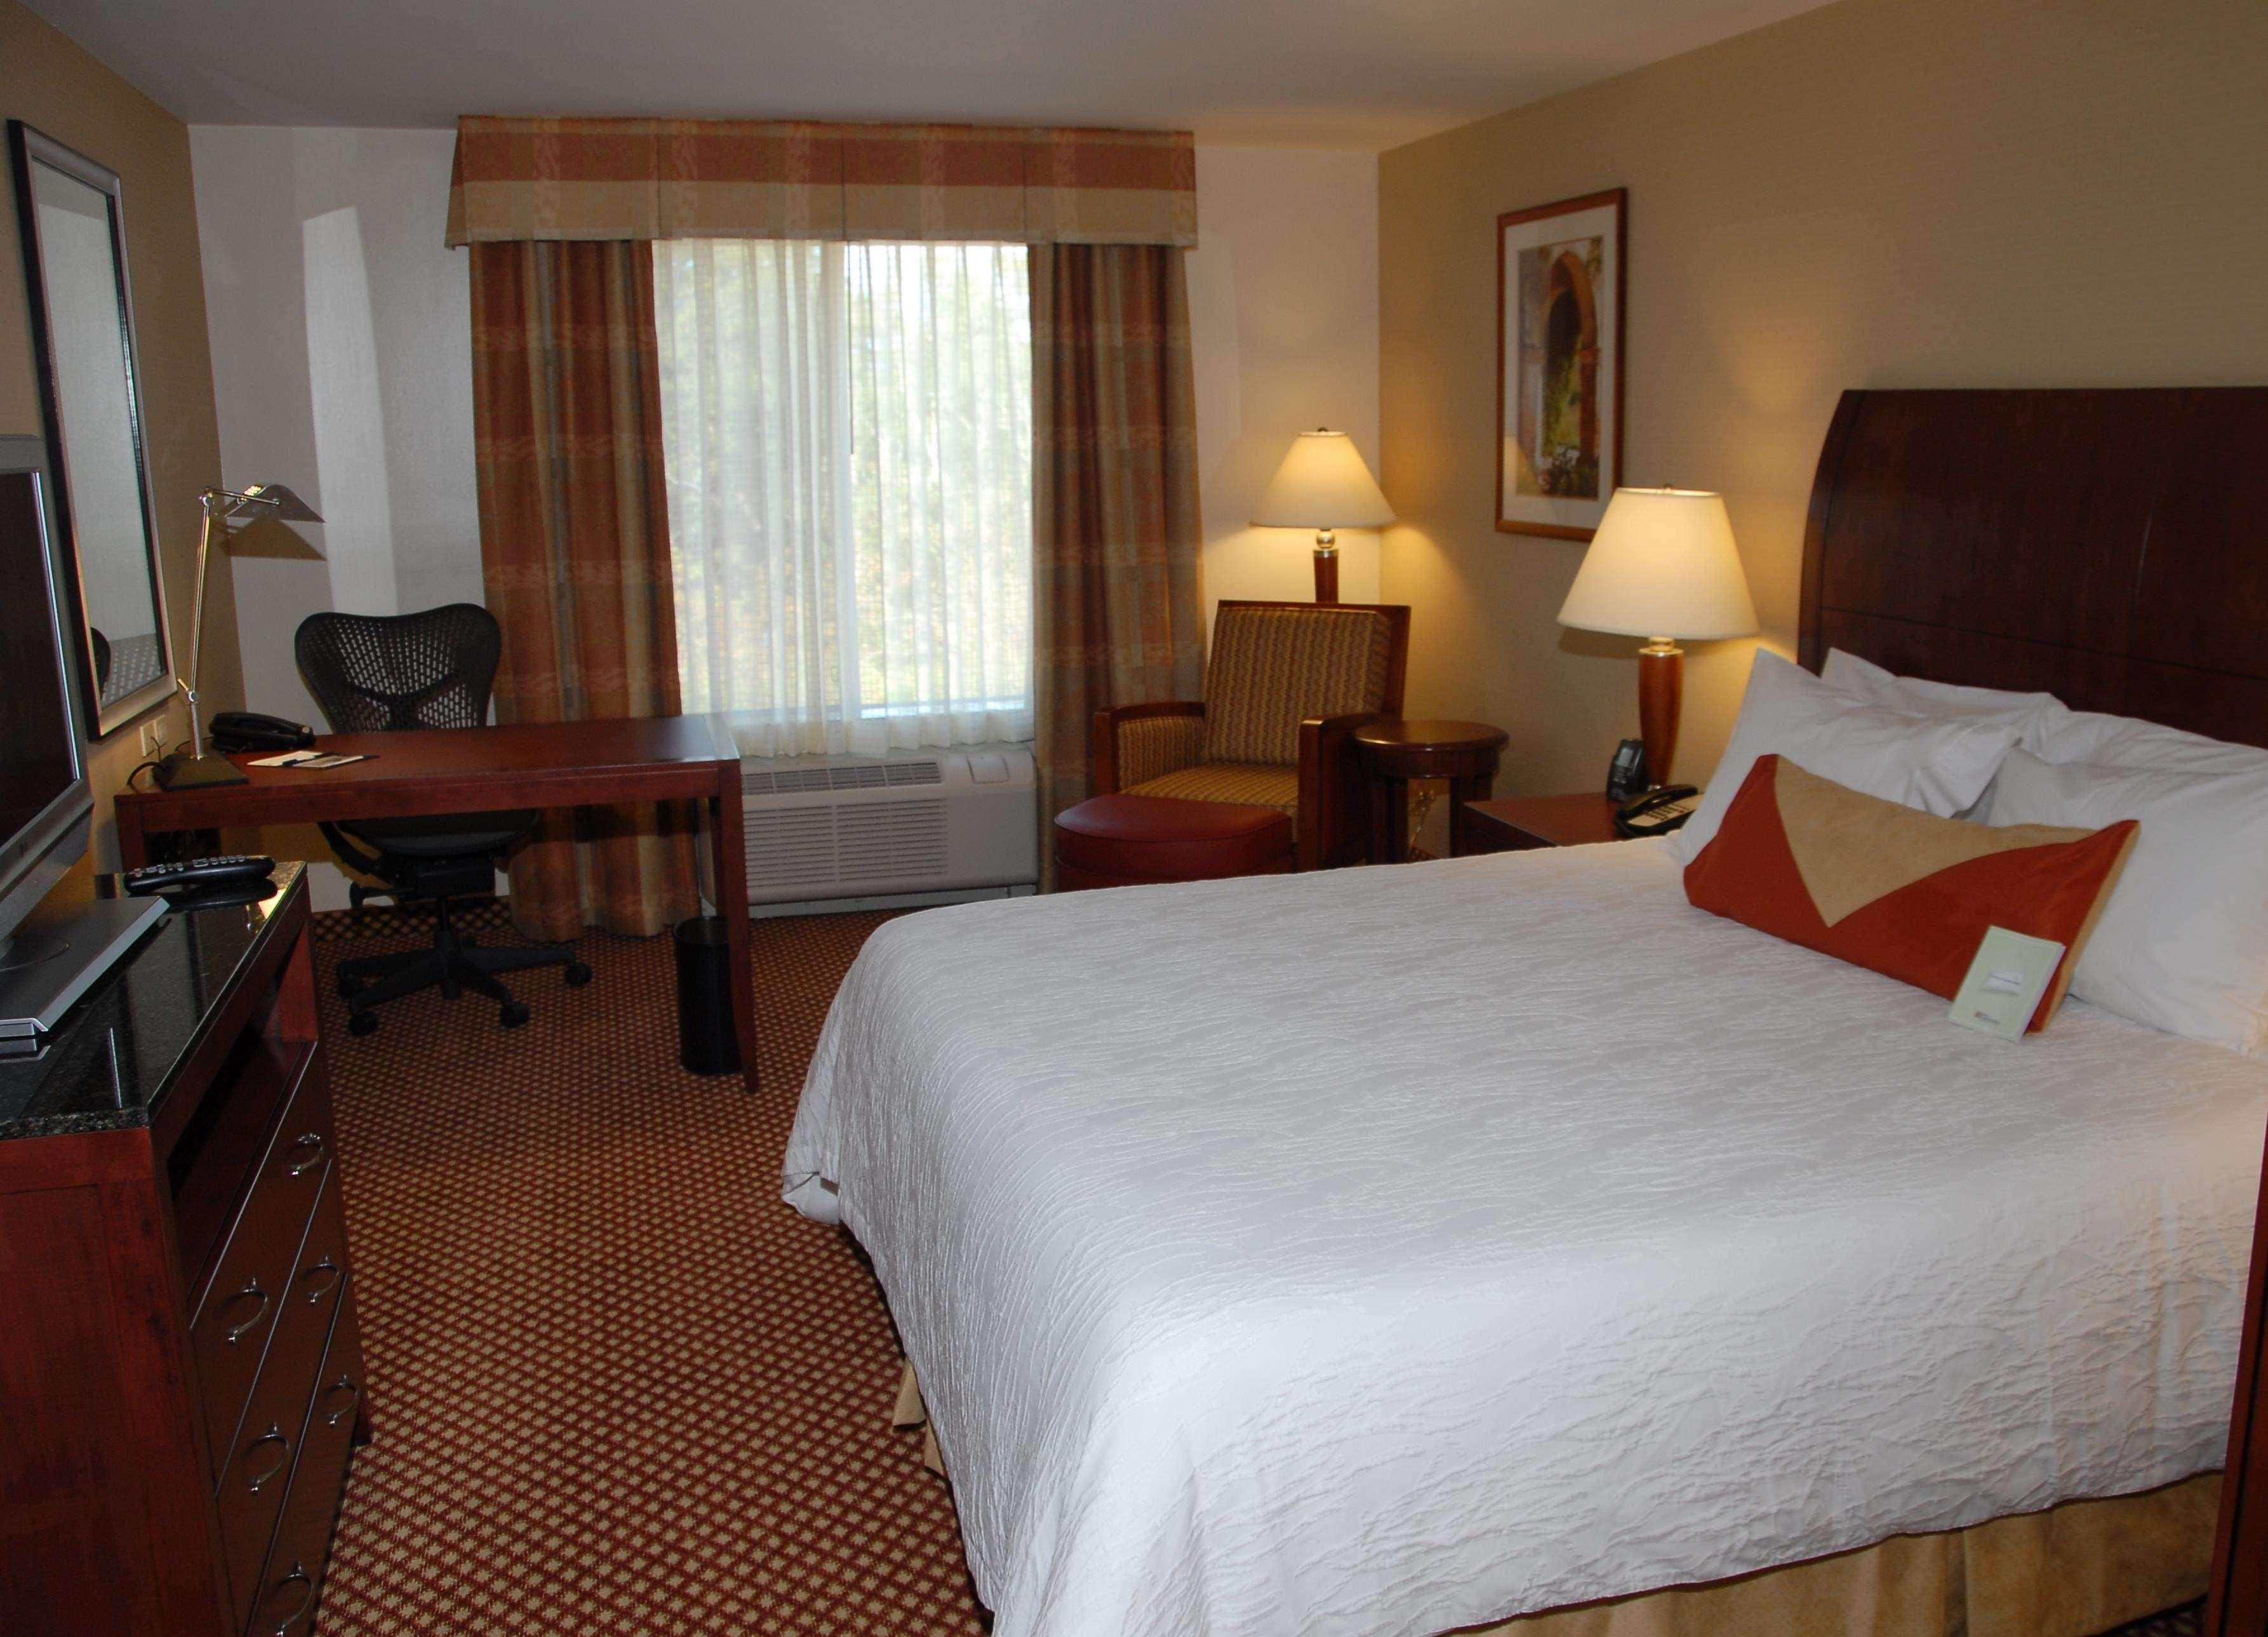 Hilton Garden Inn Riverhead image 41